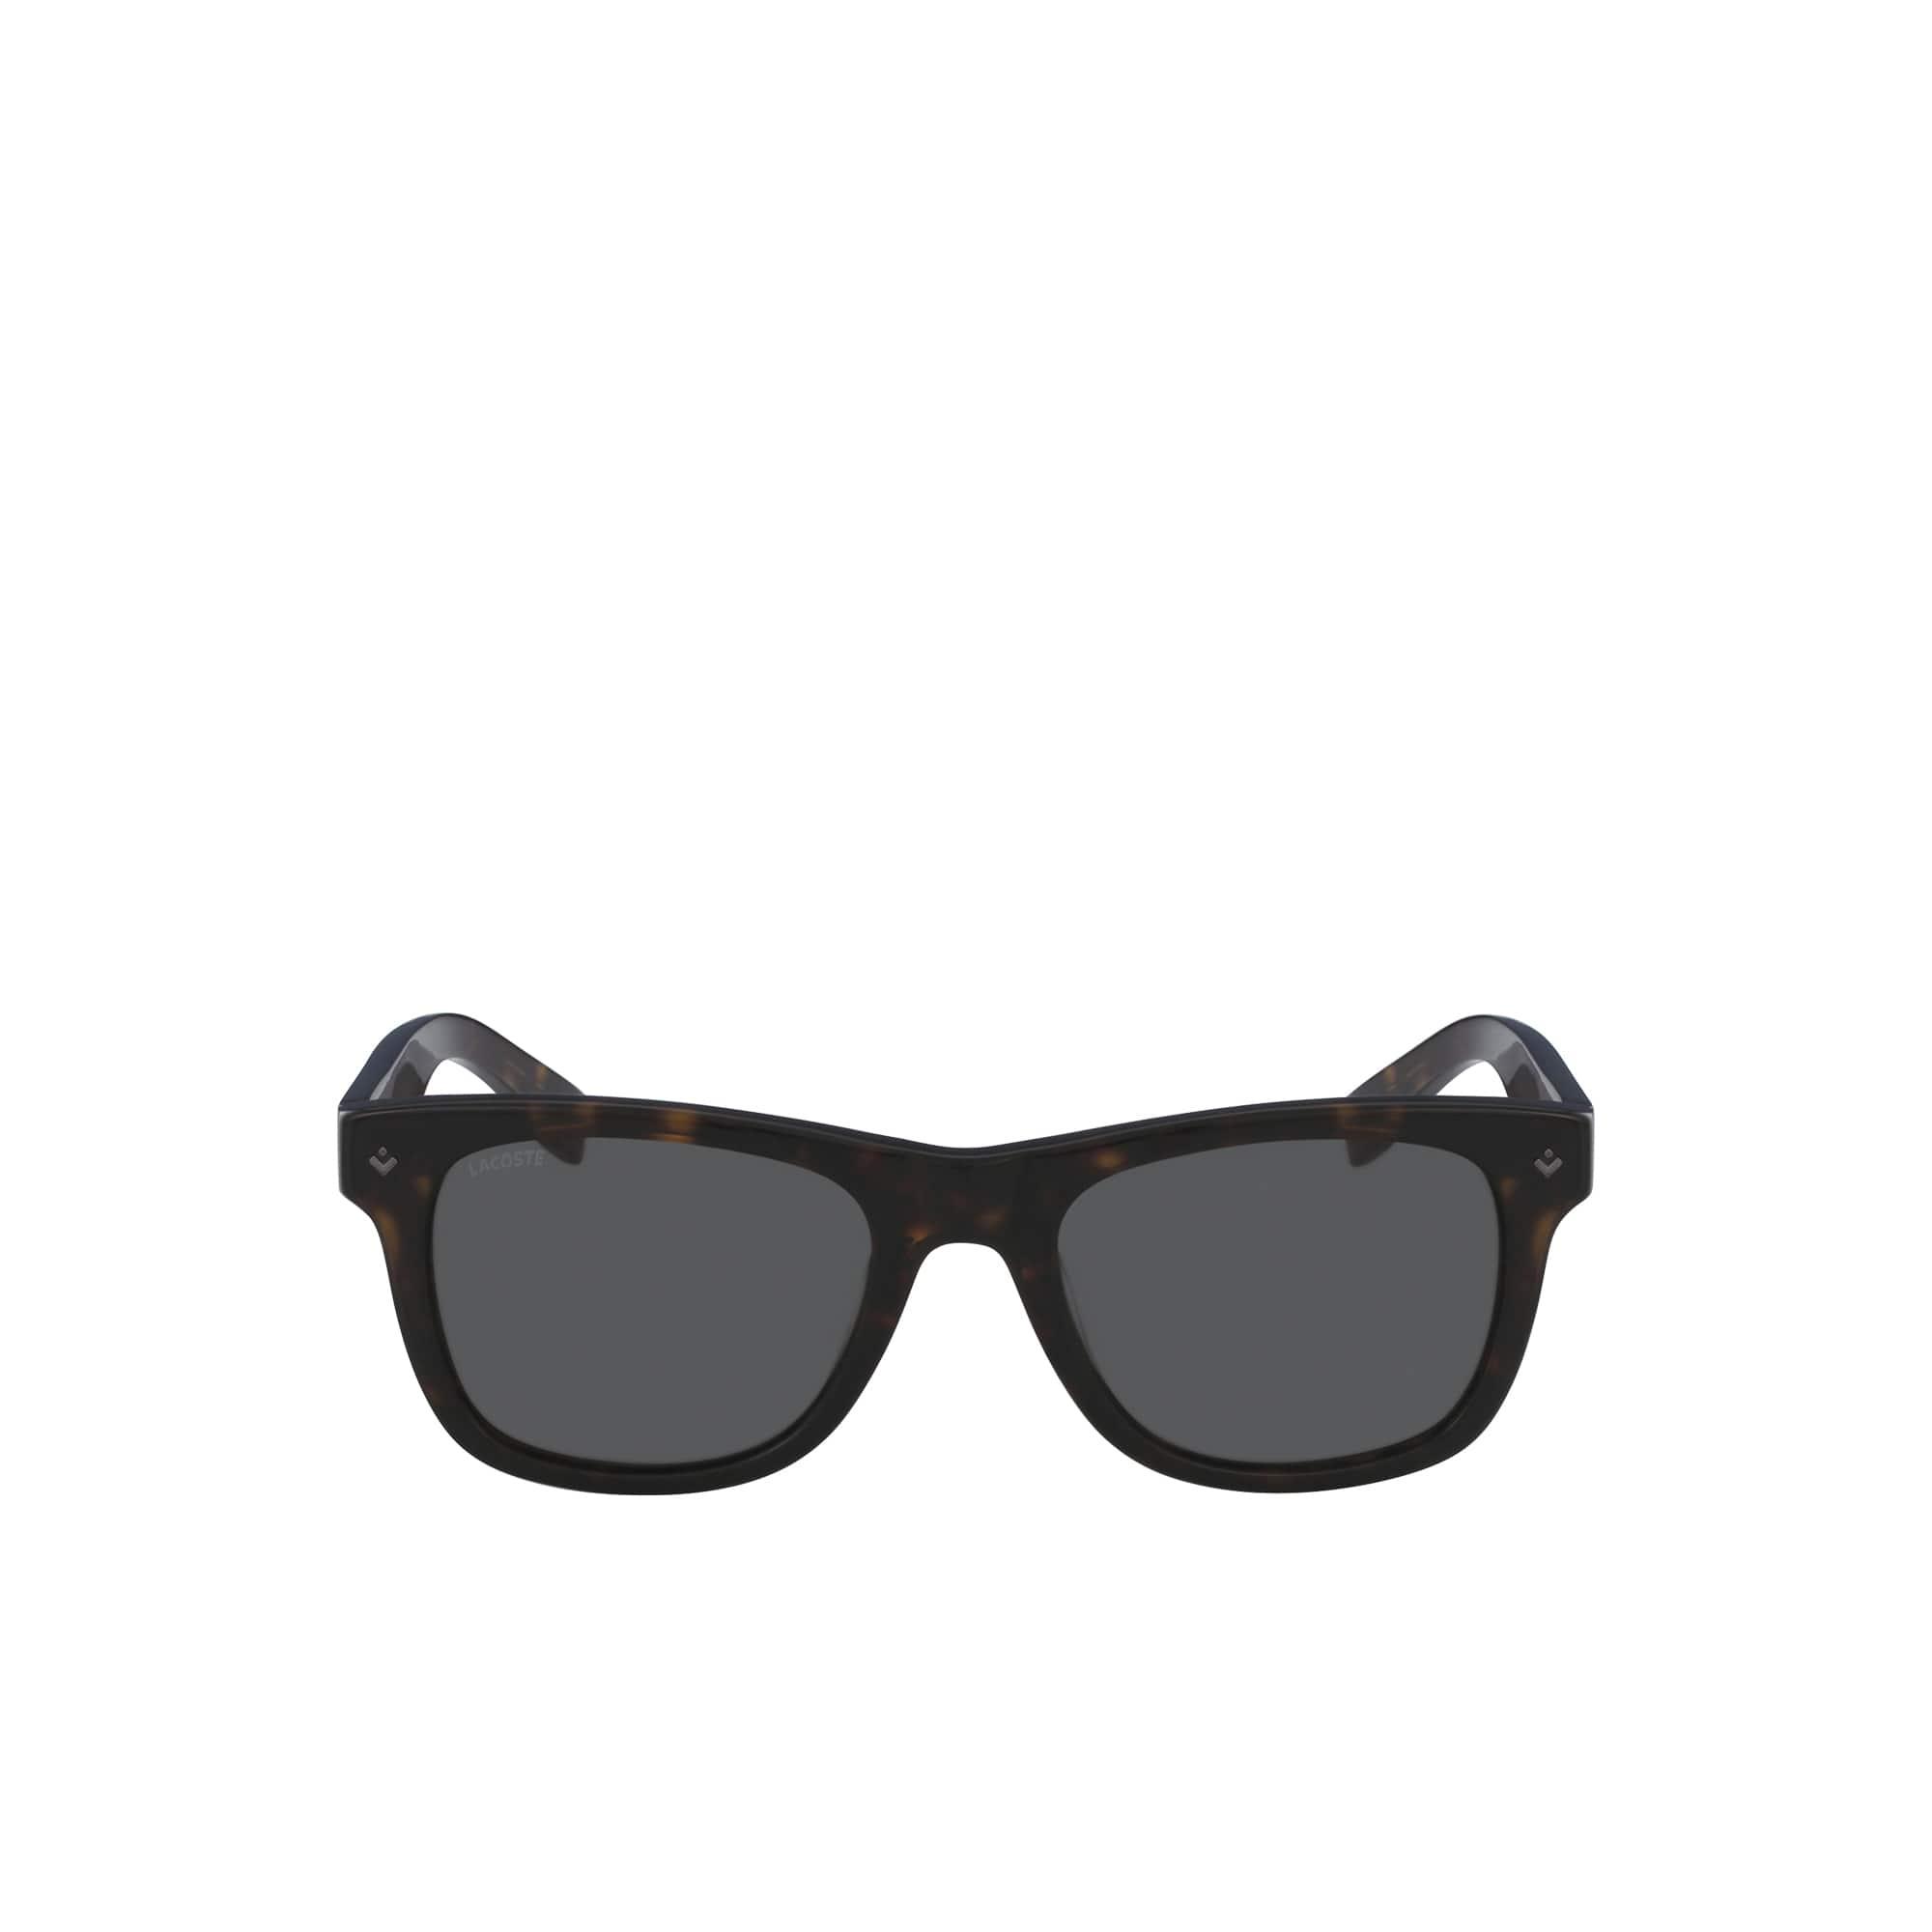 Unisex 85 Jahrestag Petit Piqué Sonnenbrille mit Acetatrahmen